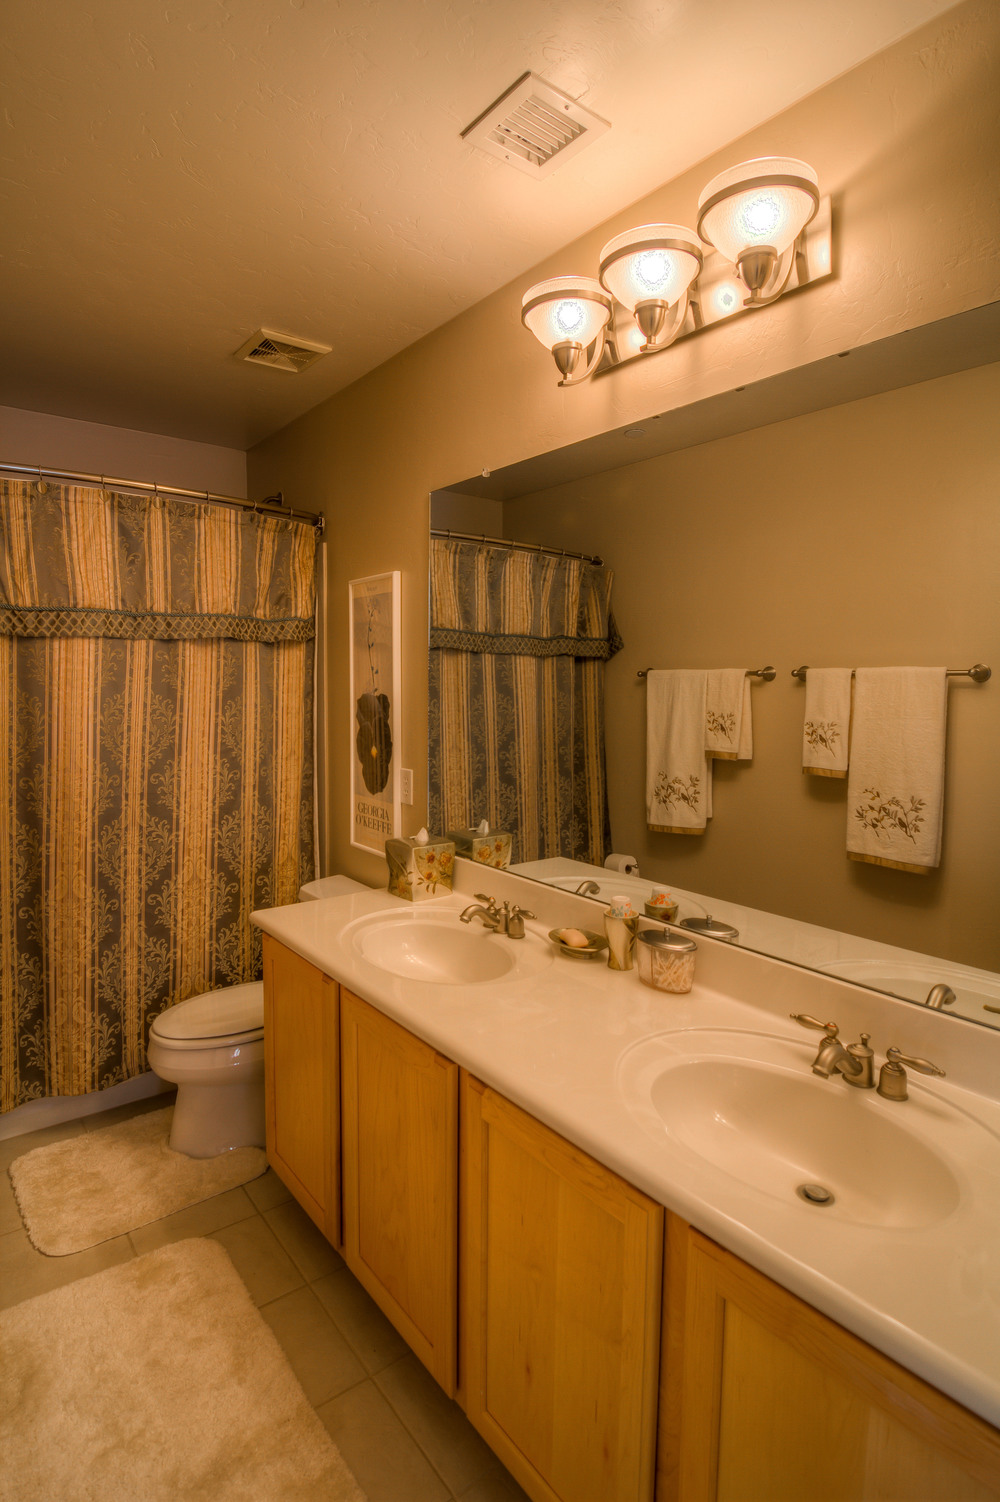 42 Upstaris Bathroom .jpg